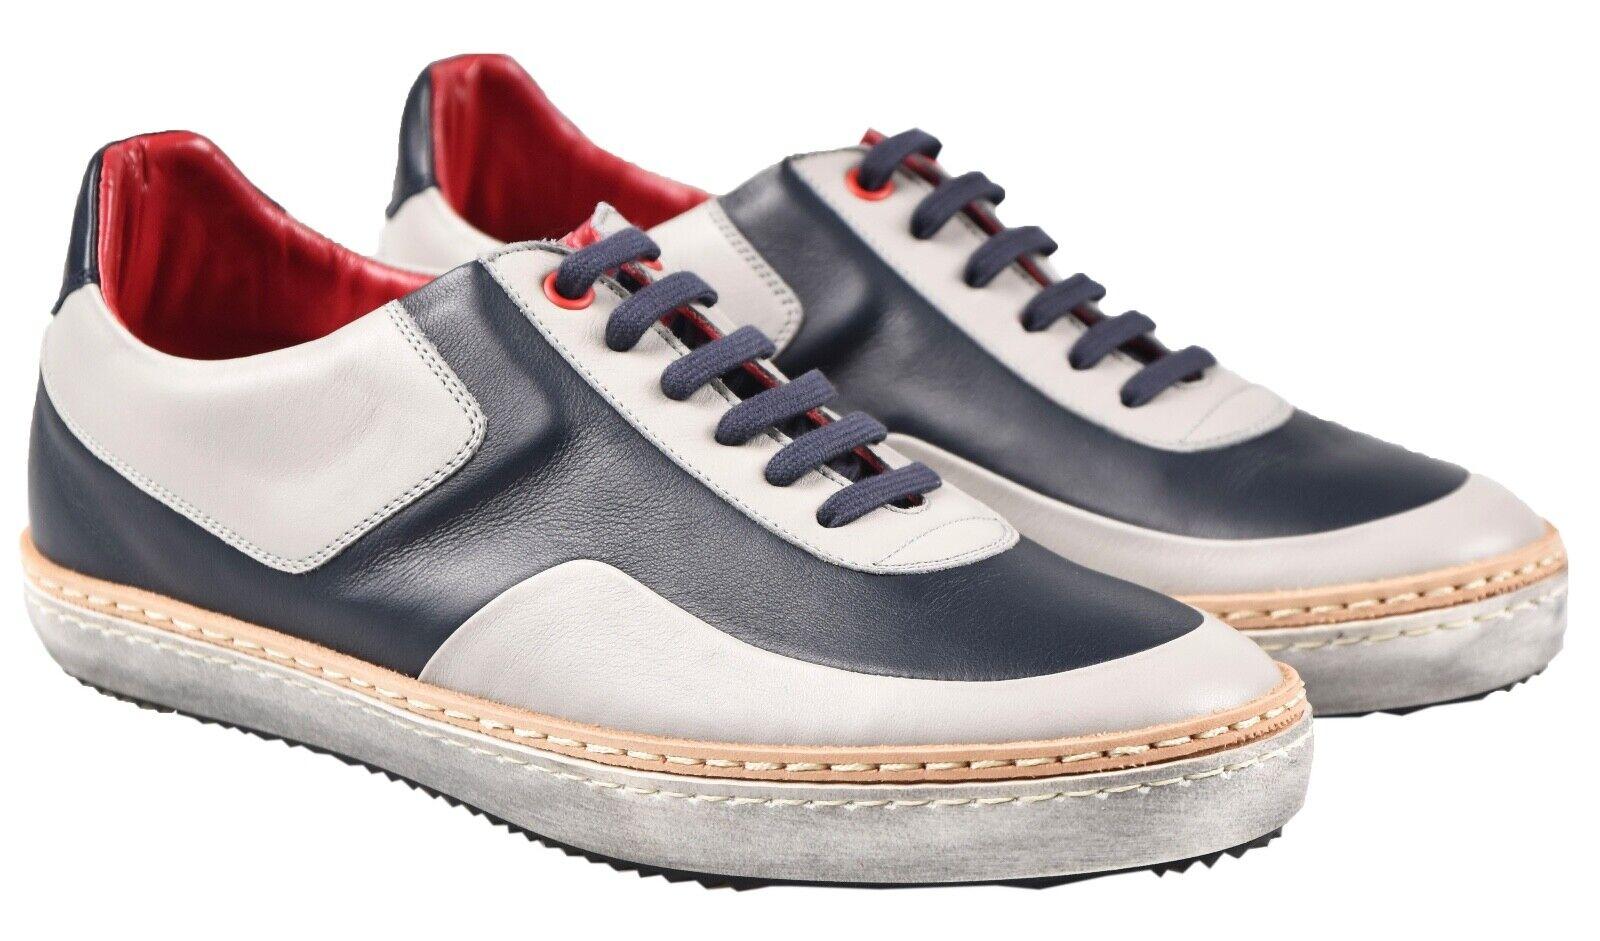 NEW KITON scarpe da ginnastica scarpe 100% LEATHER SZ 7.5 US 40.5 EU 19O139